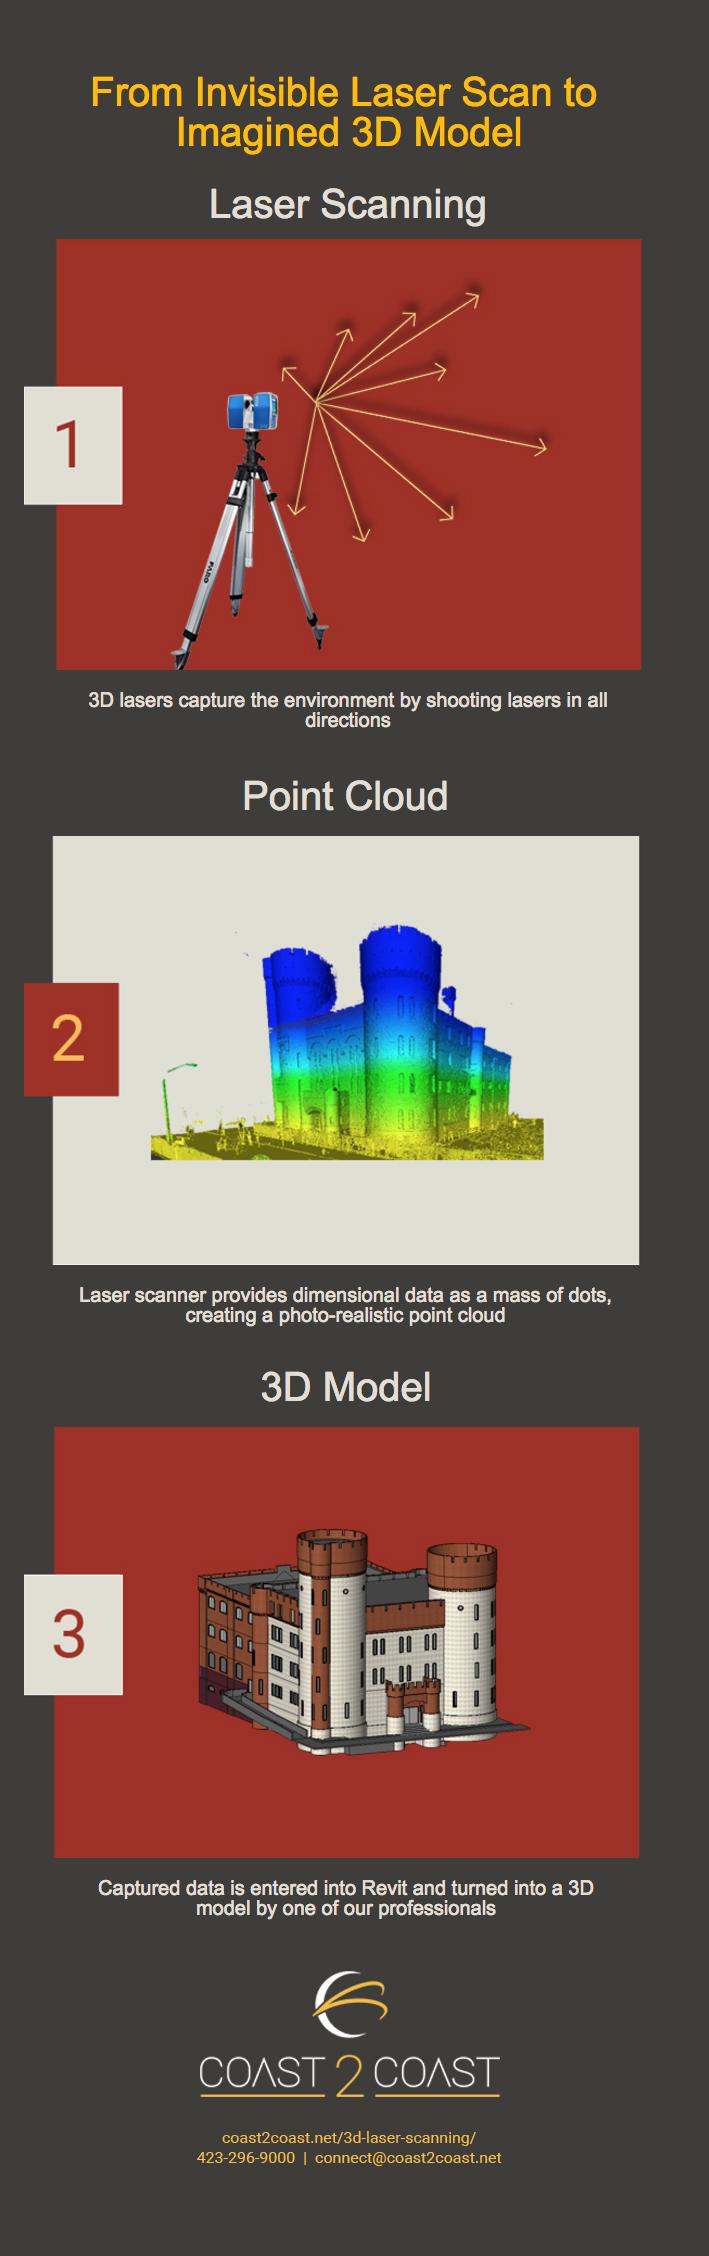 Coast 2 Coast 3D Laser Scanning Infographic